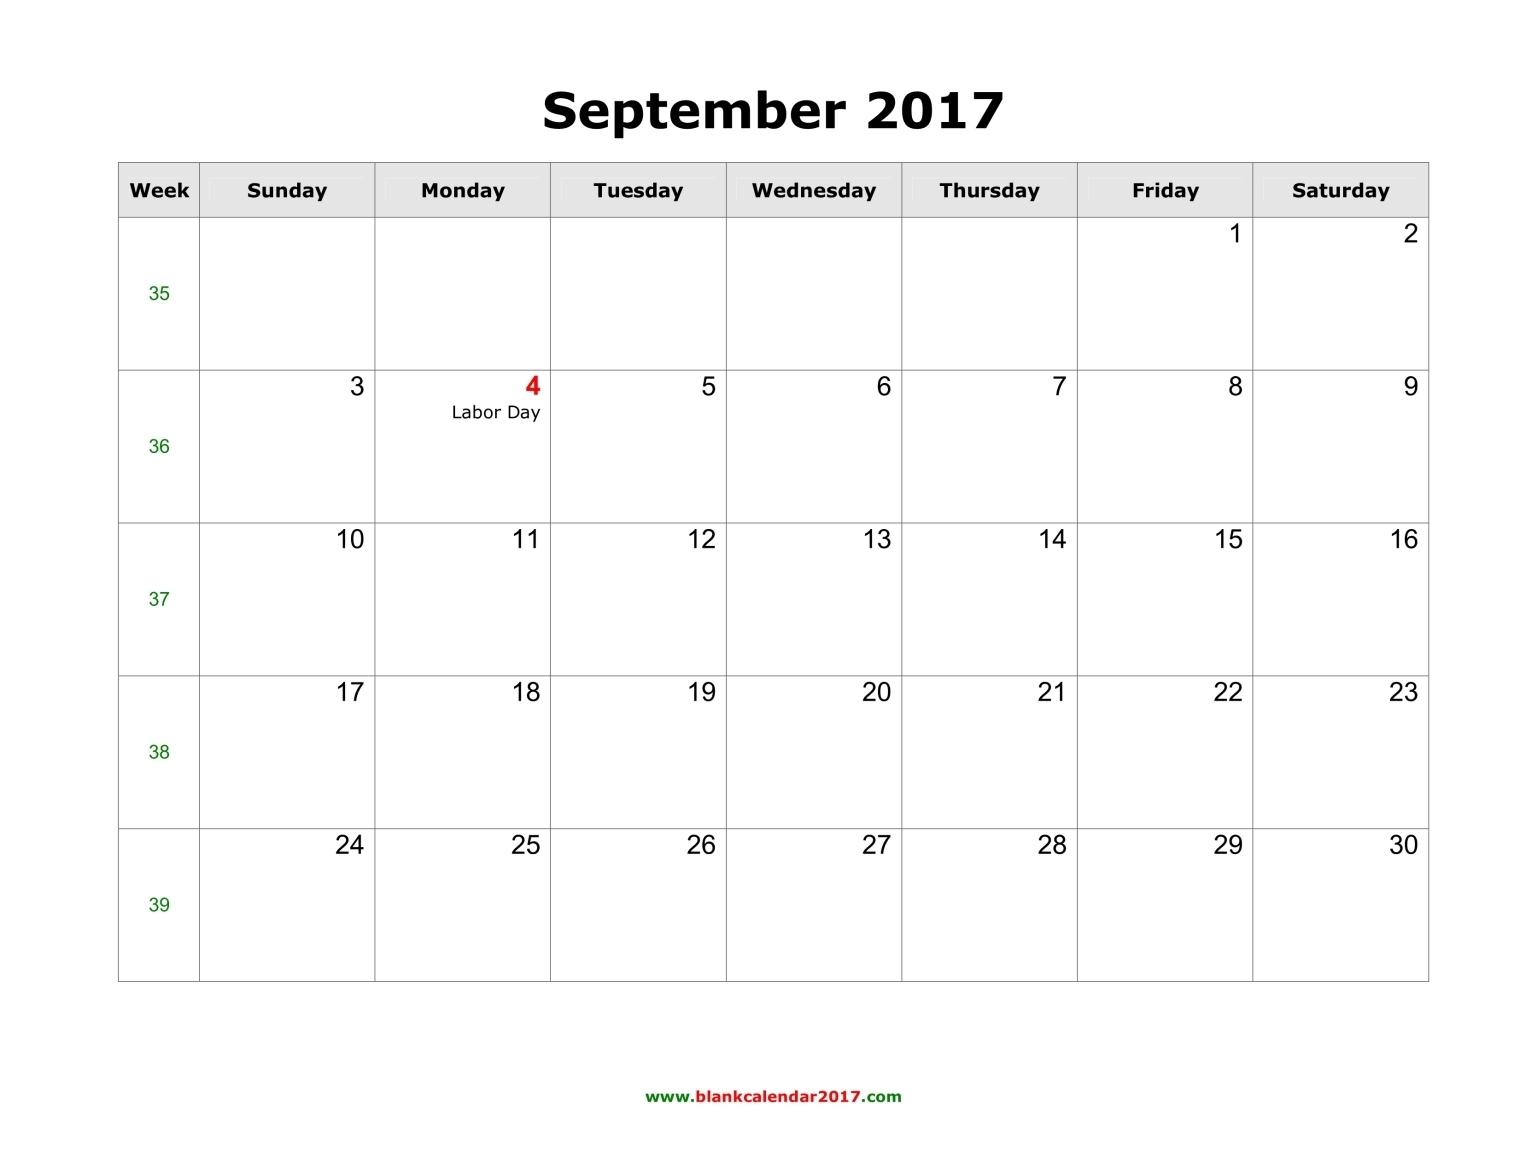 November 2017 Calendar With Holidays Uk | weekly calendar template